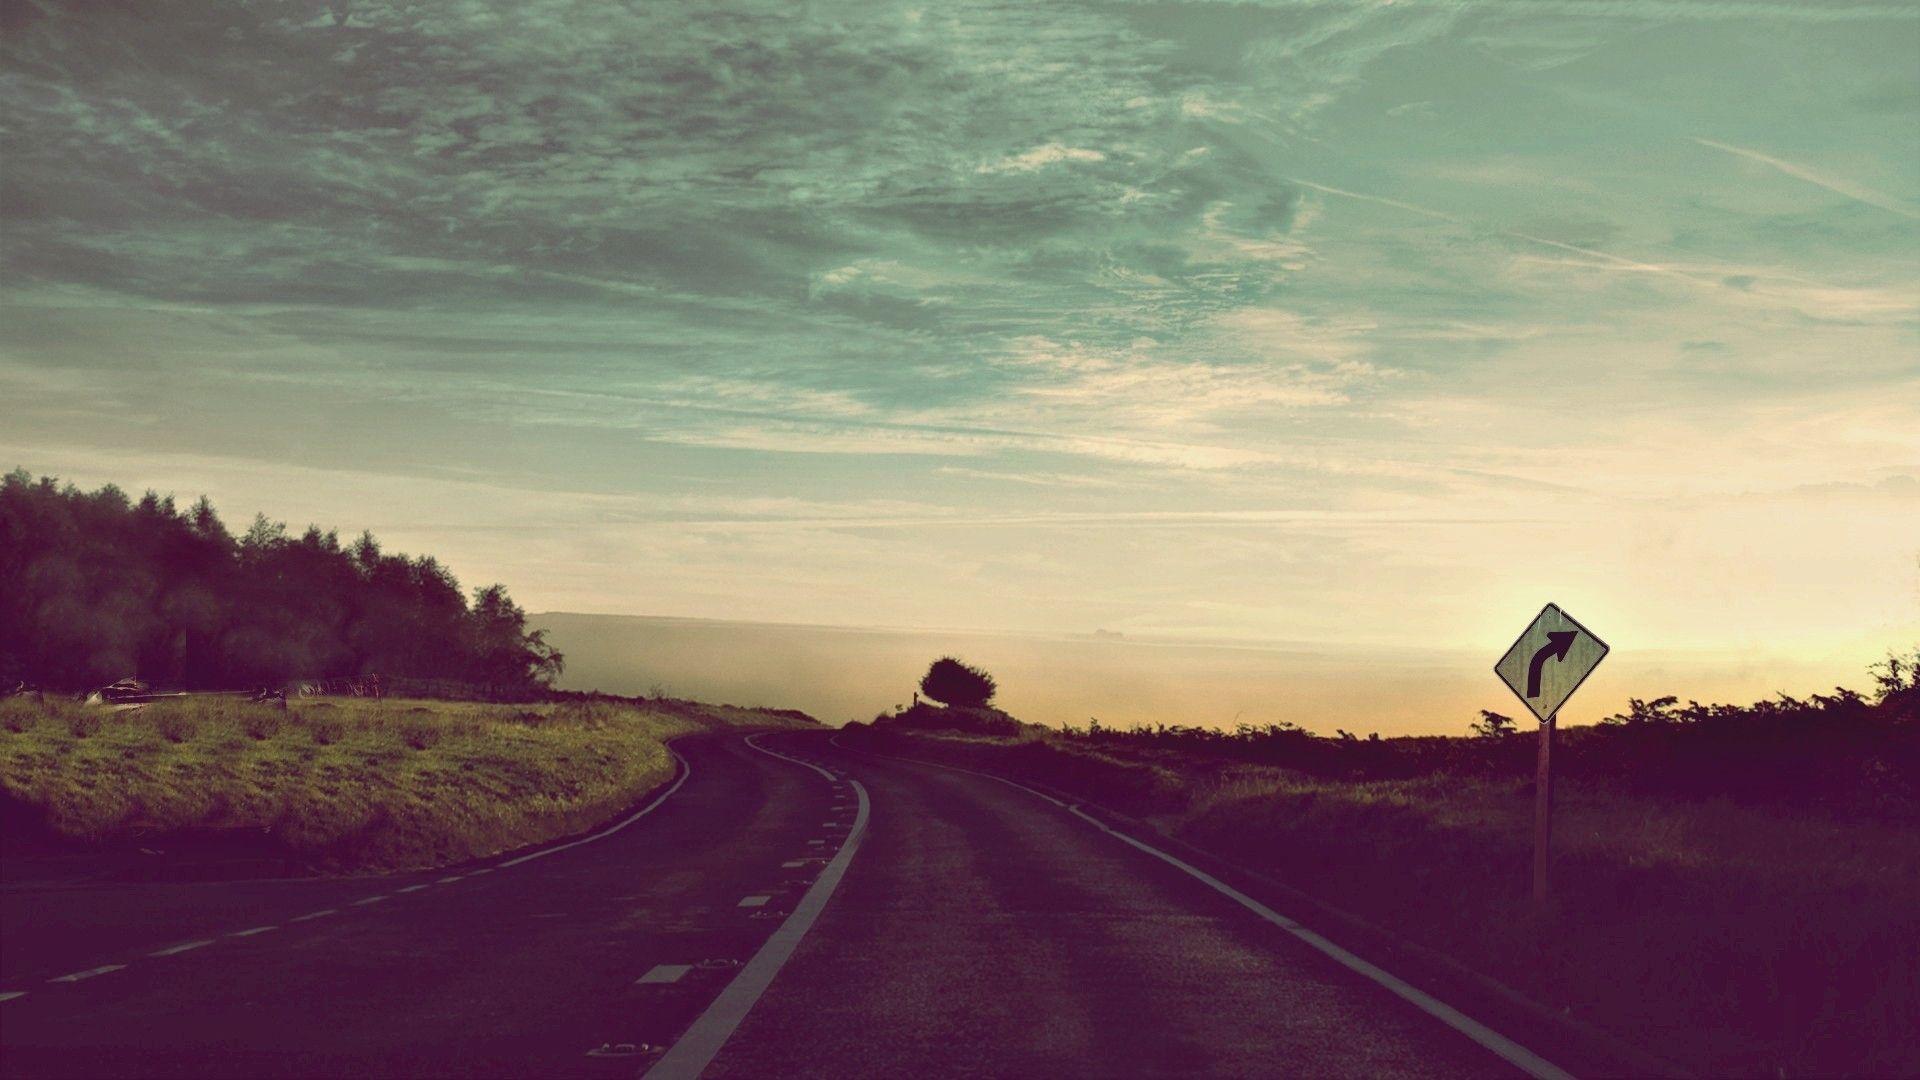 Download 81 Wallpaper Tumblr Landscape HD Terbaru